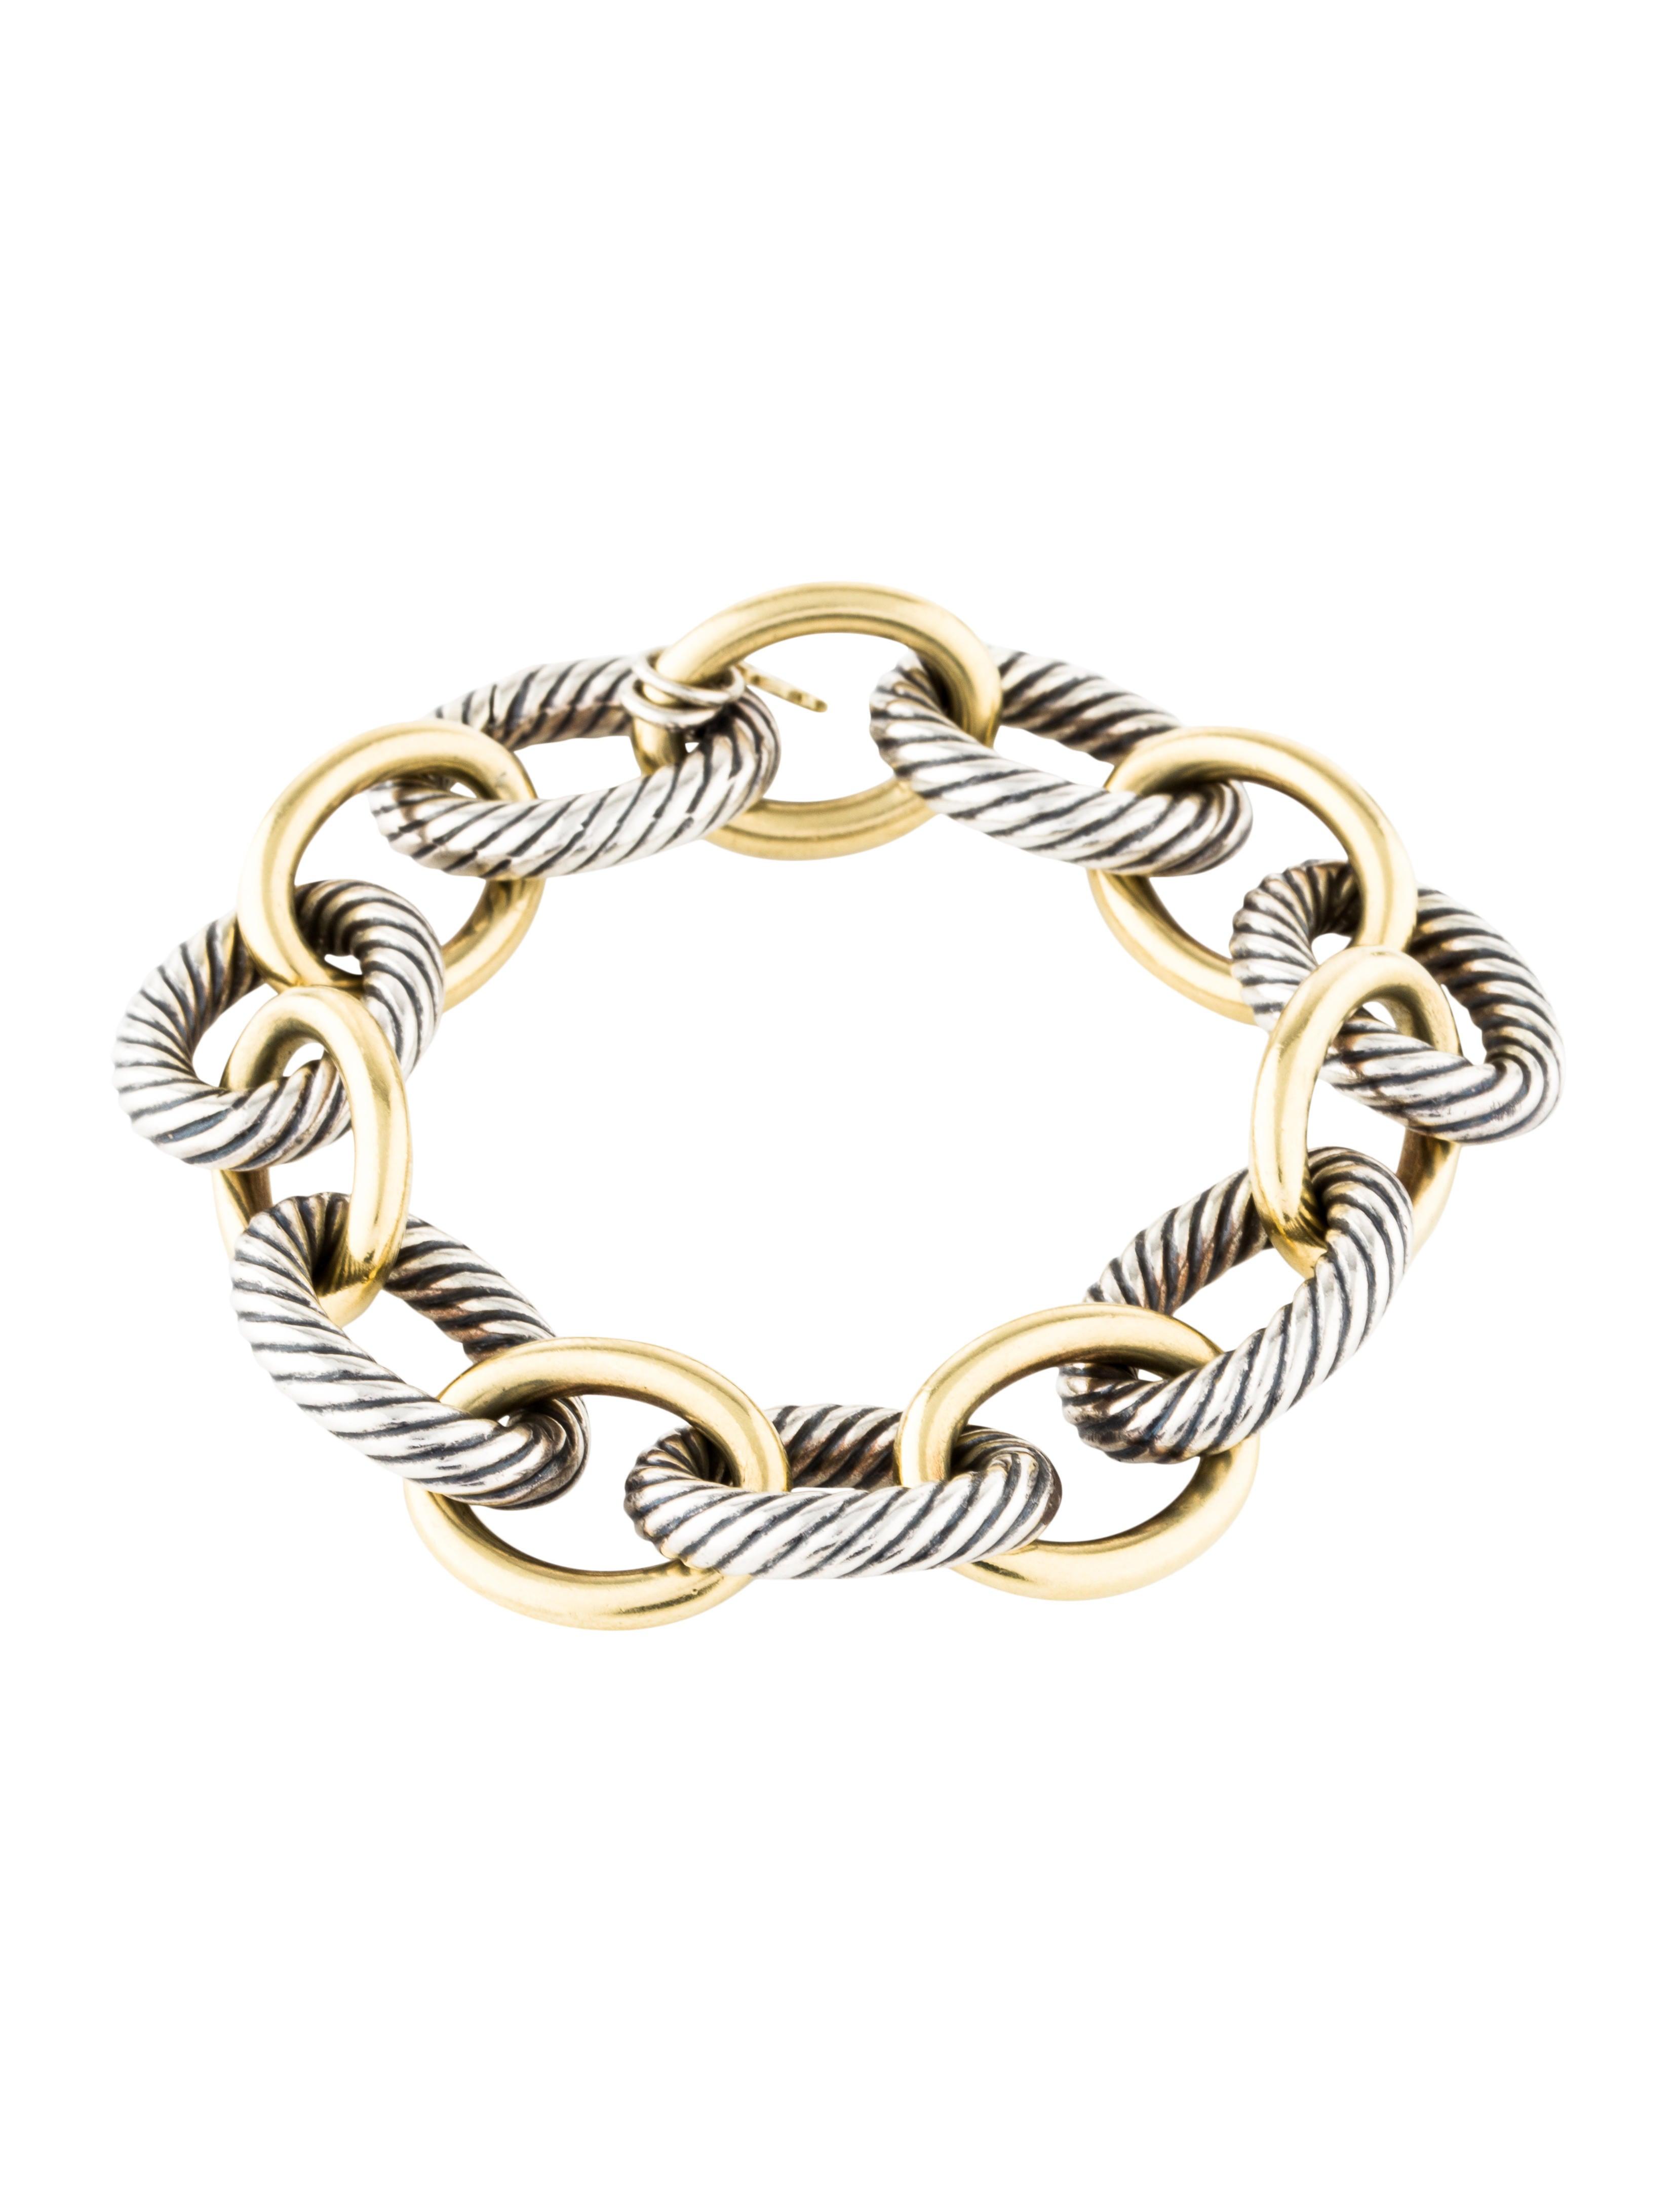 be170e0f211b3 Two-Tone Extra Large Oval Link Bracelet